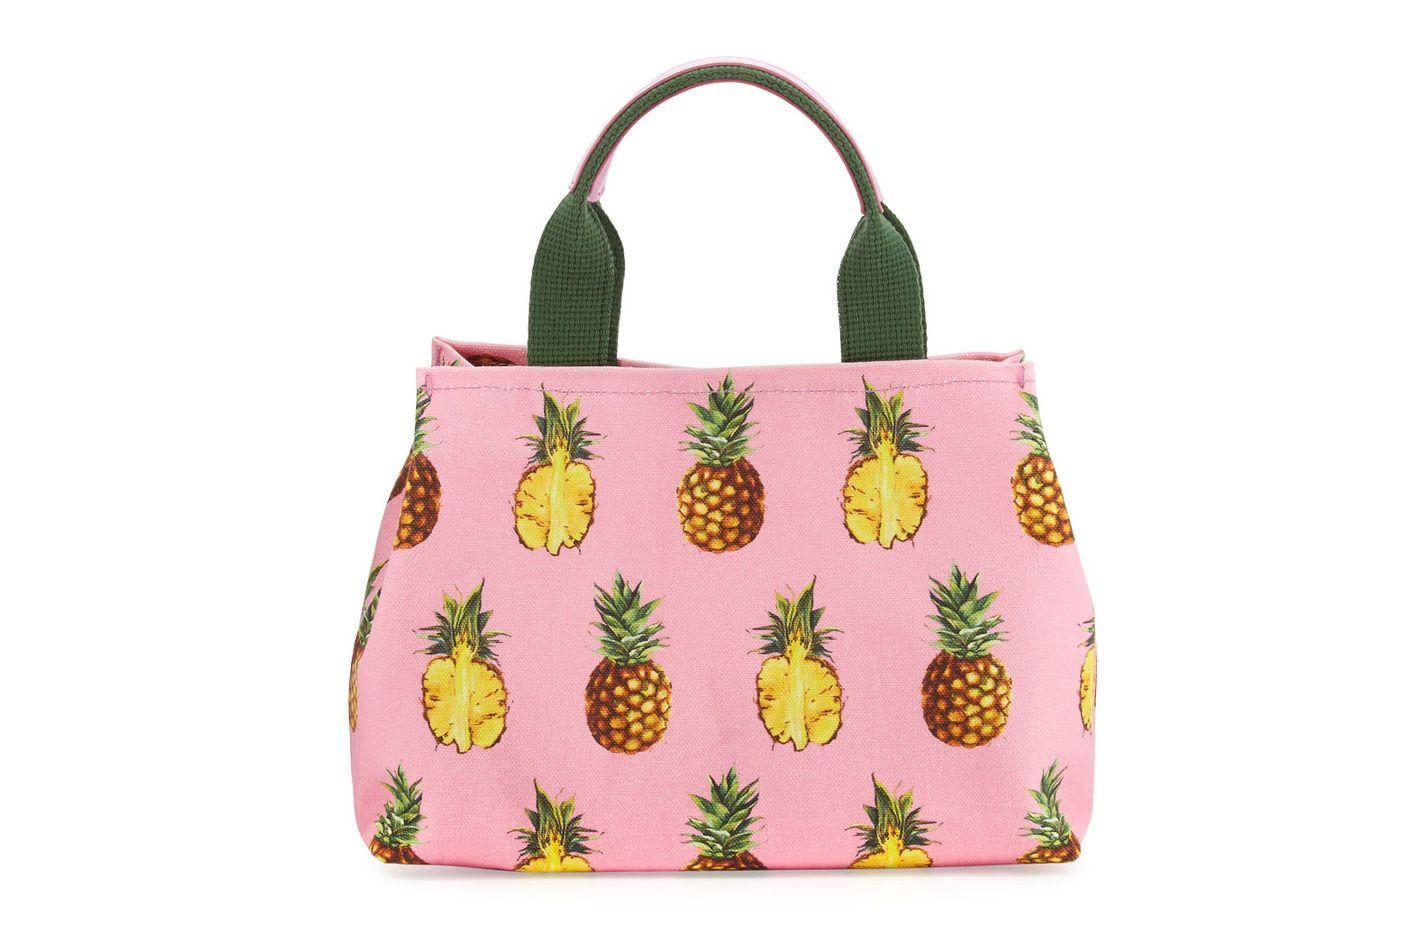 Dolce & Gabbana Pineapple-Print Canvas Tote Bag